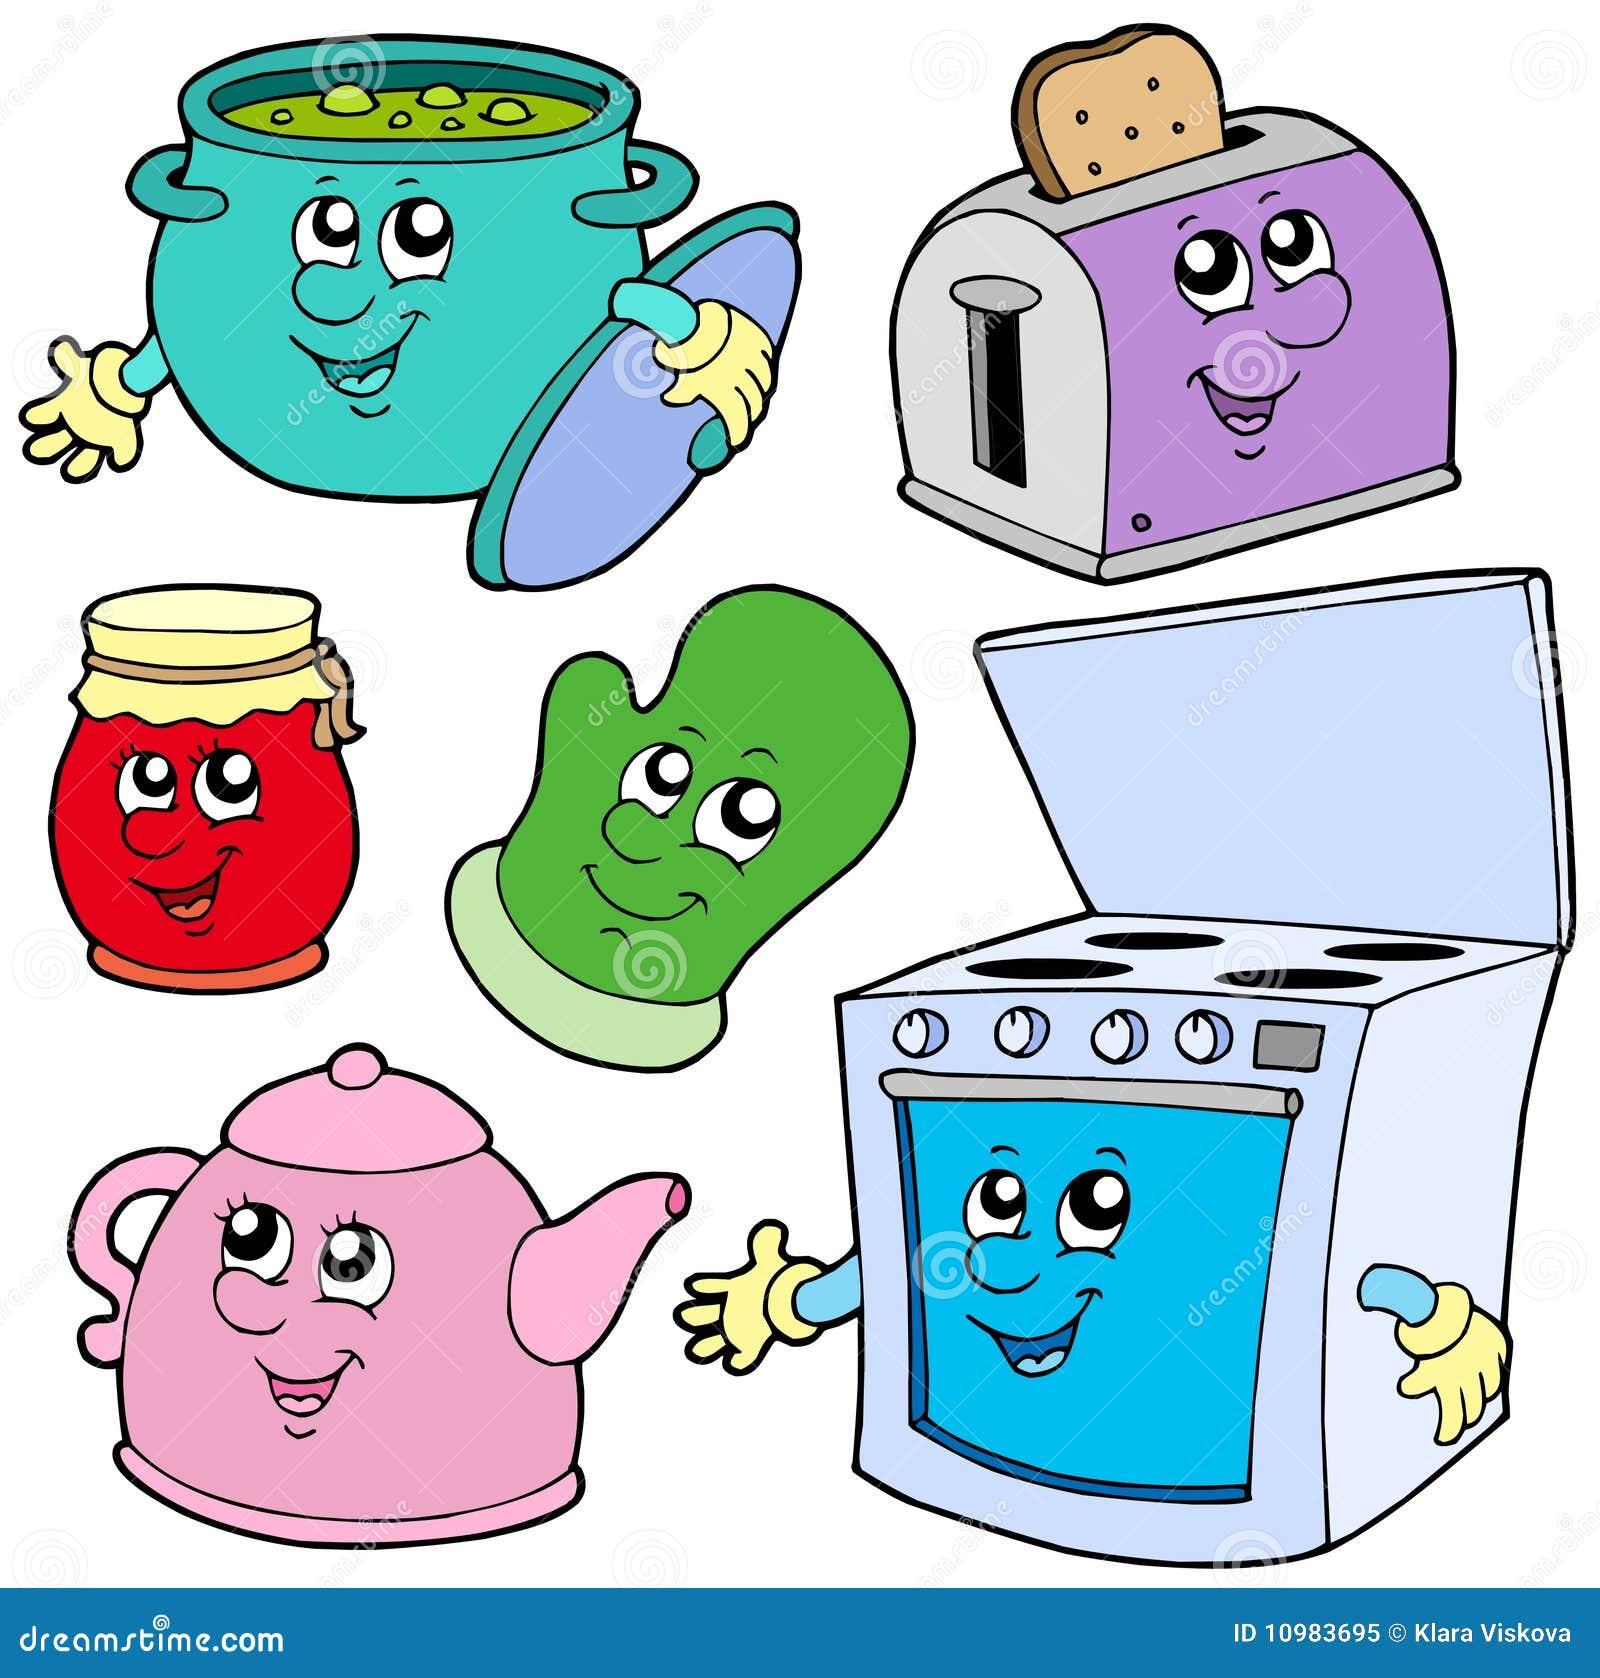 #C90218 Kitchen Cartoons Royalty Free Stock Photo Image: 10983695 1300x1380 px Nova Cozinha Desenhos Imagens_617 Imagens